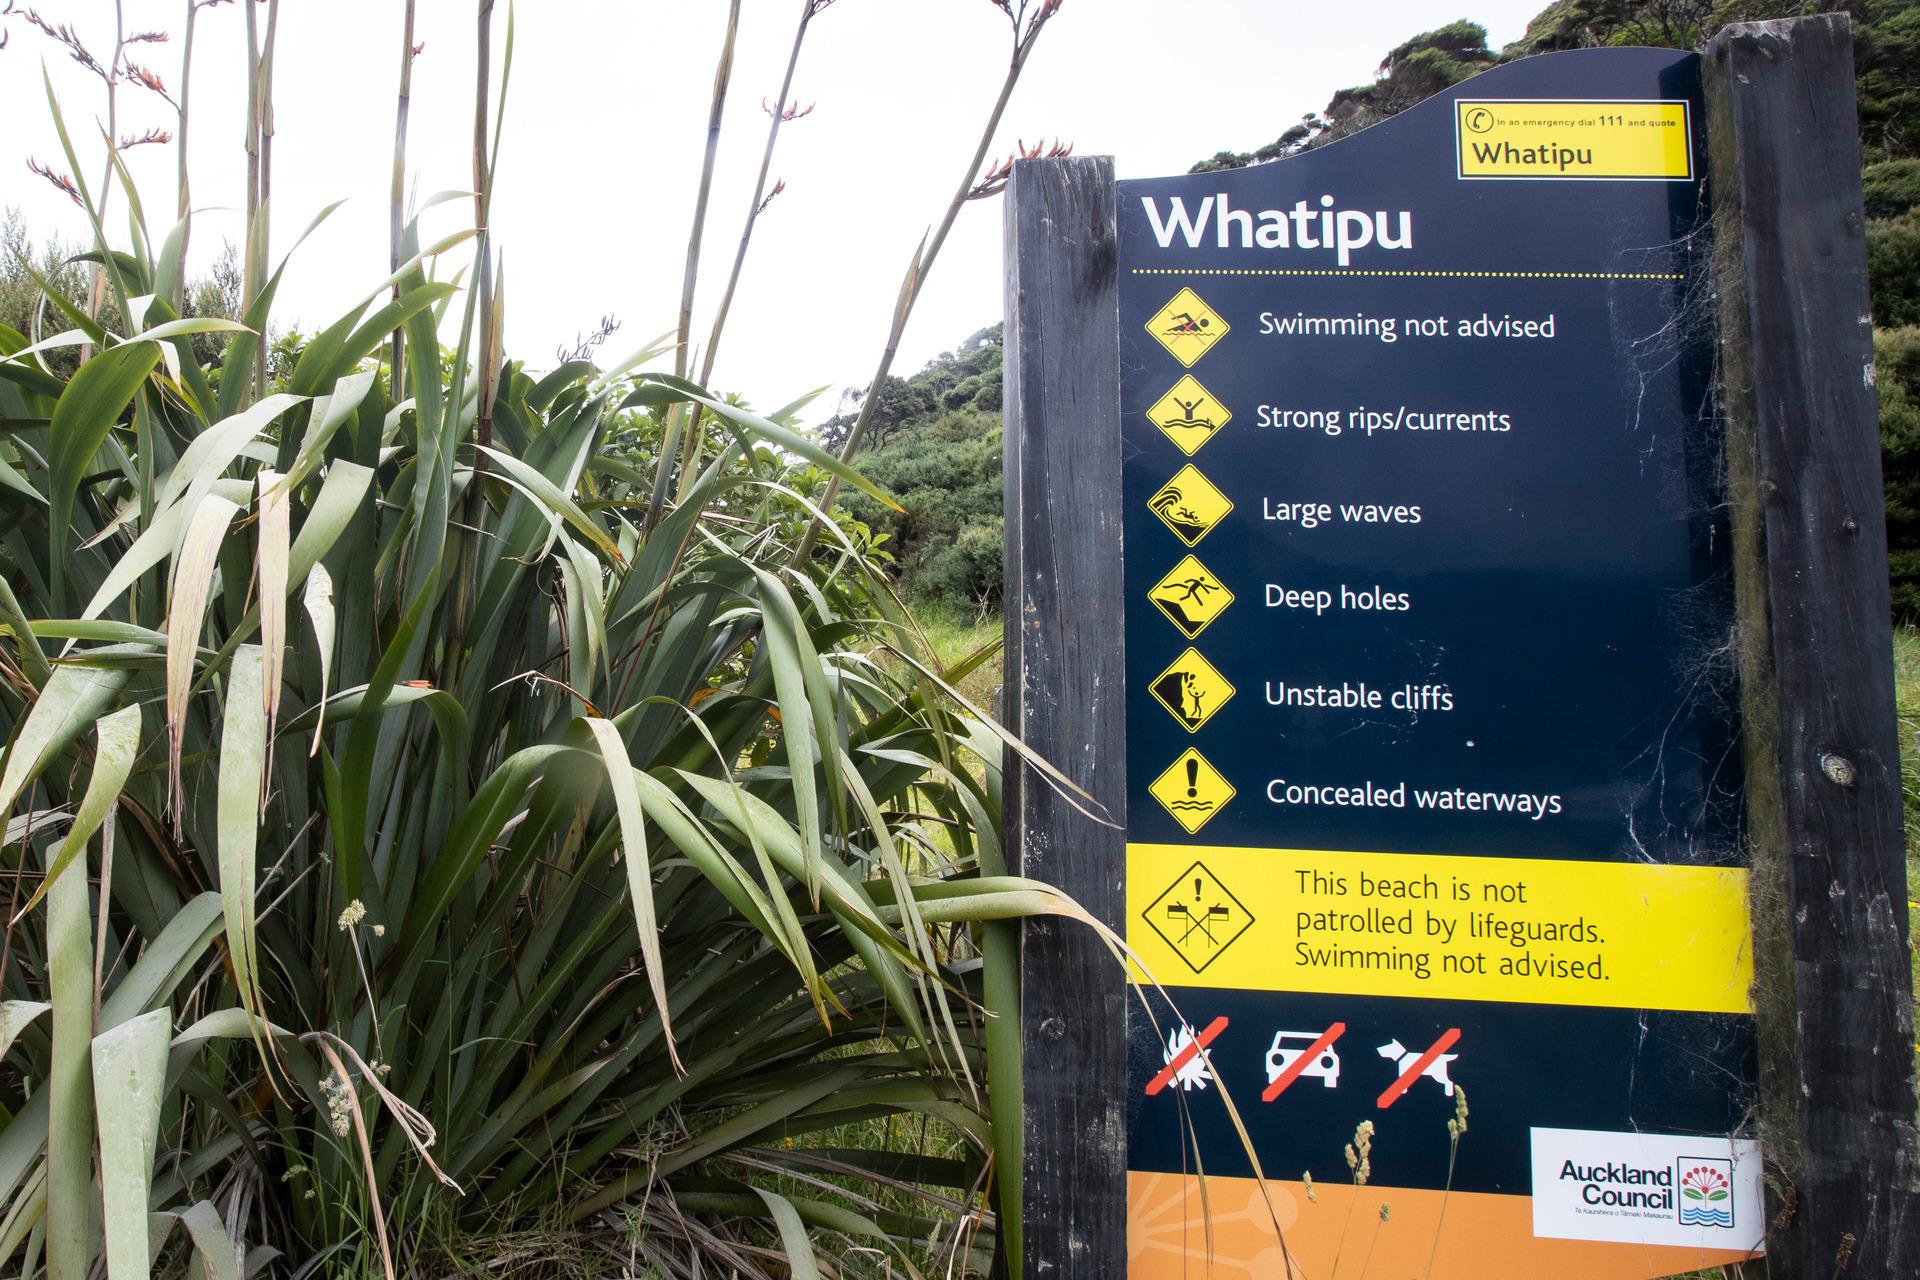 Fisherman swept off rocks at Whatipu Beach presumed dead